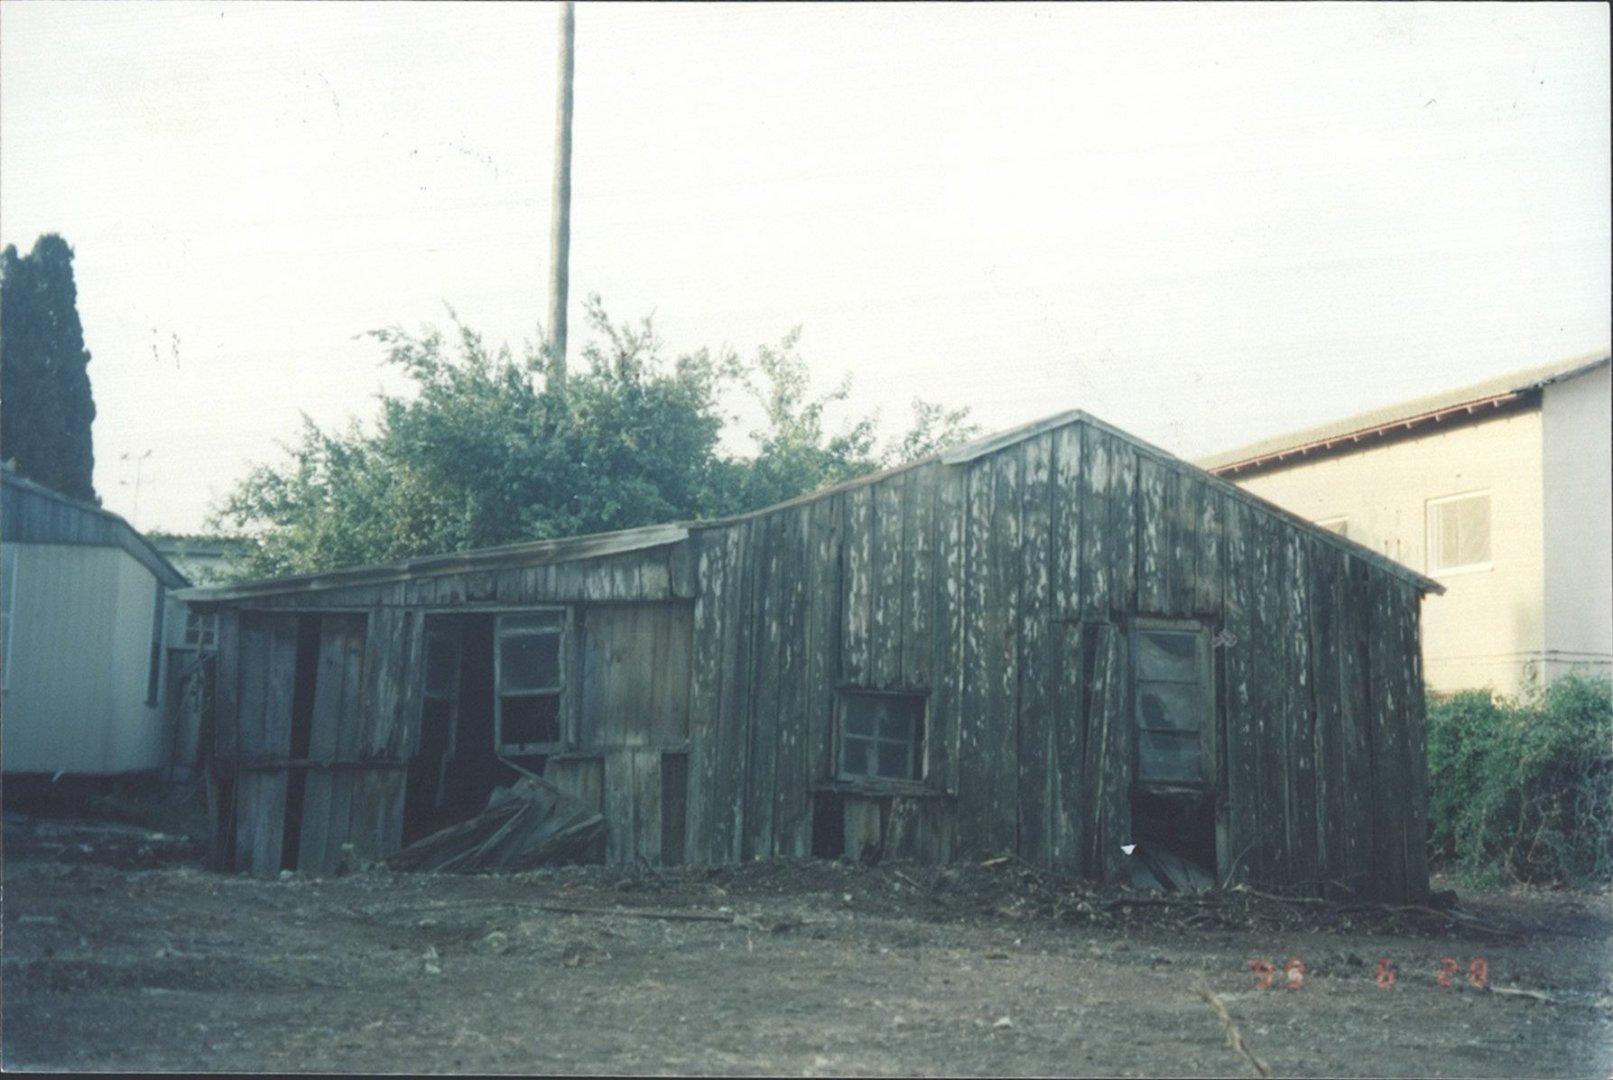 3 00380161 tif  הצריף של שולמן מאחורי בית ארבל היום